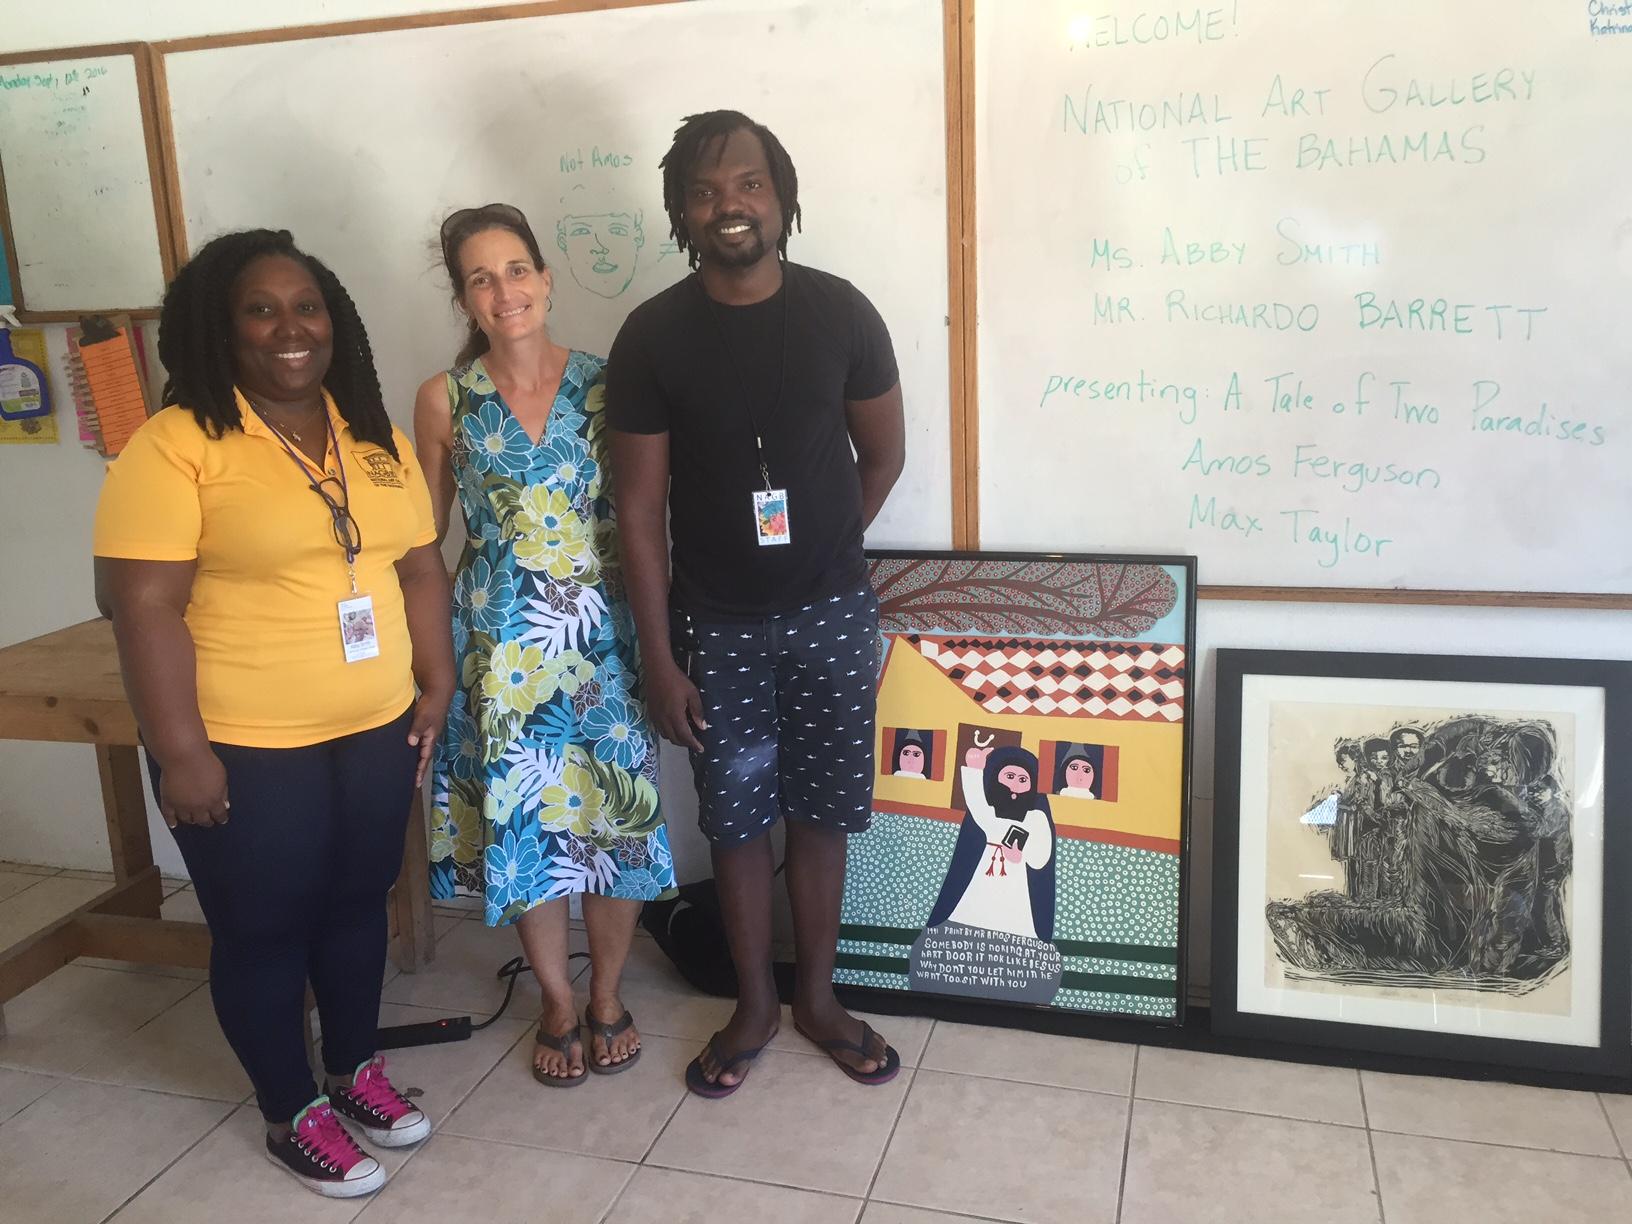 Abby Smith, Lisa Schmitt, and Richardo Barrett celebrate the artwork at DCMS.